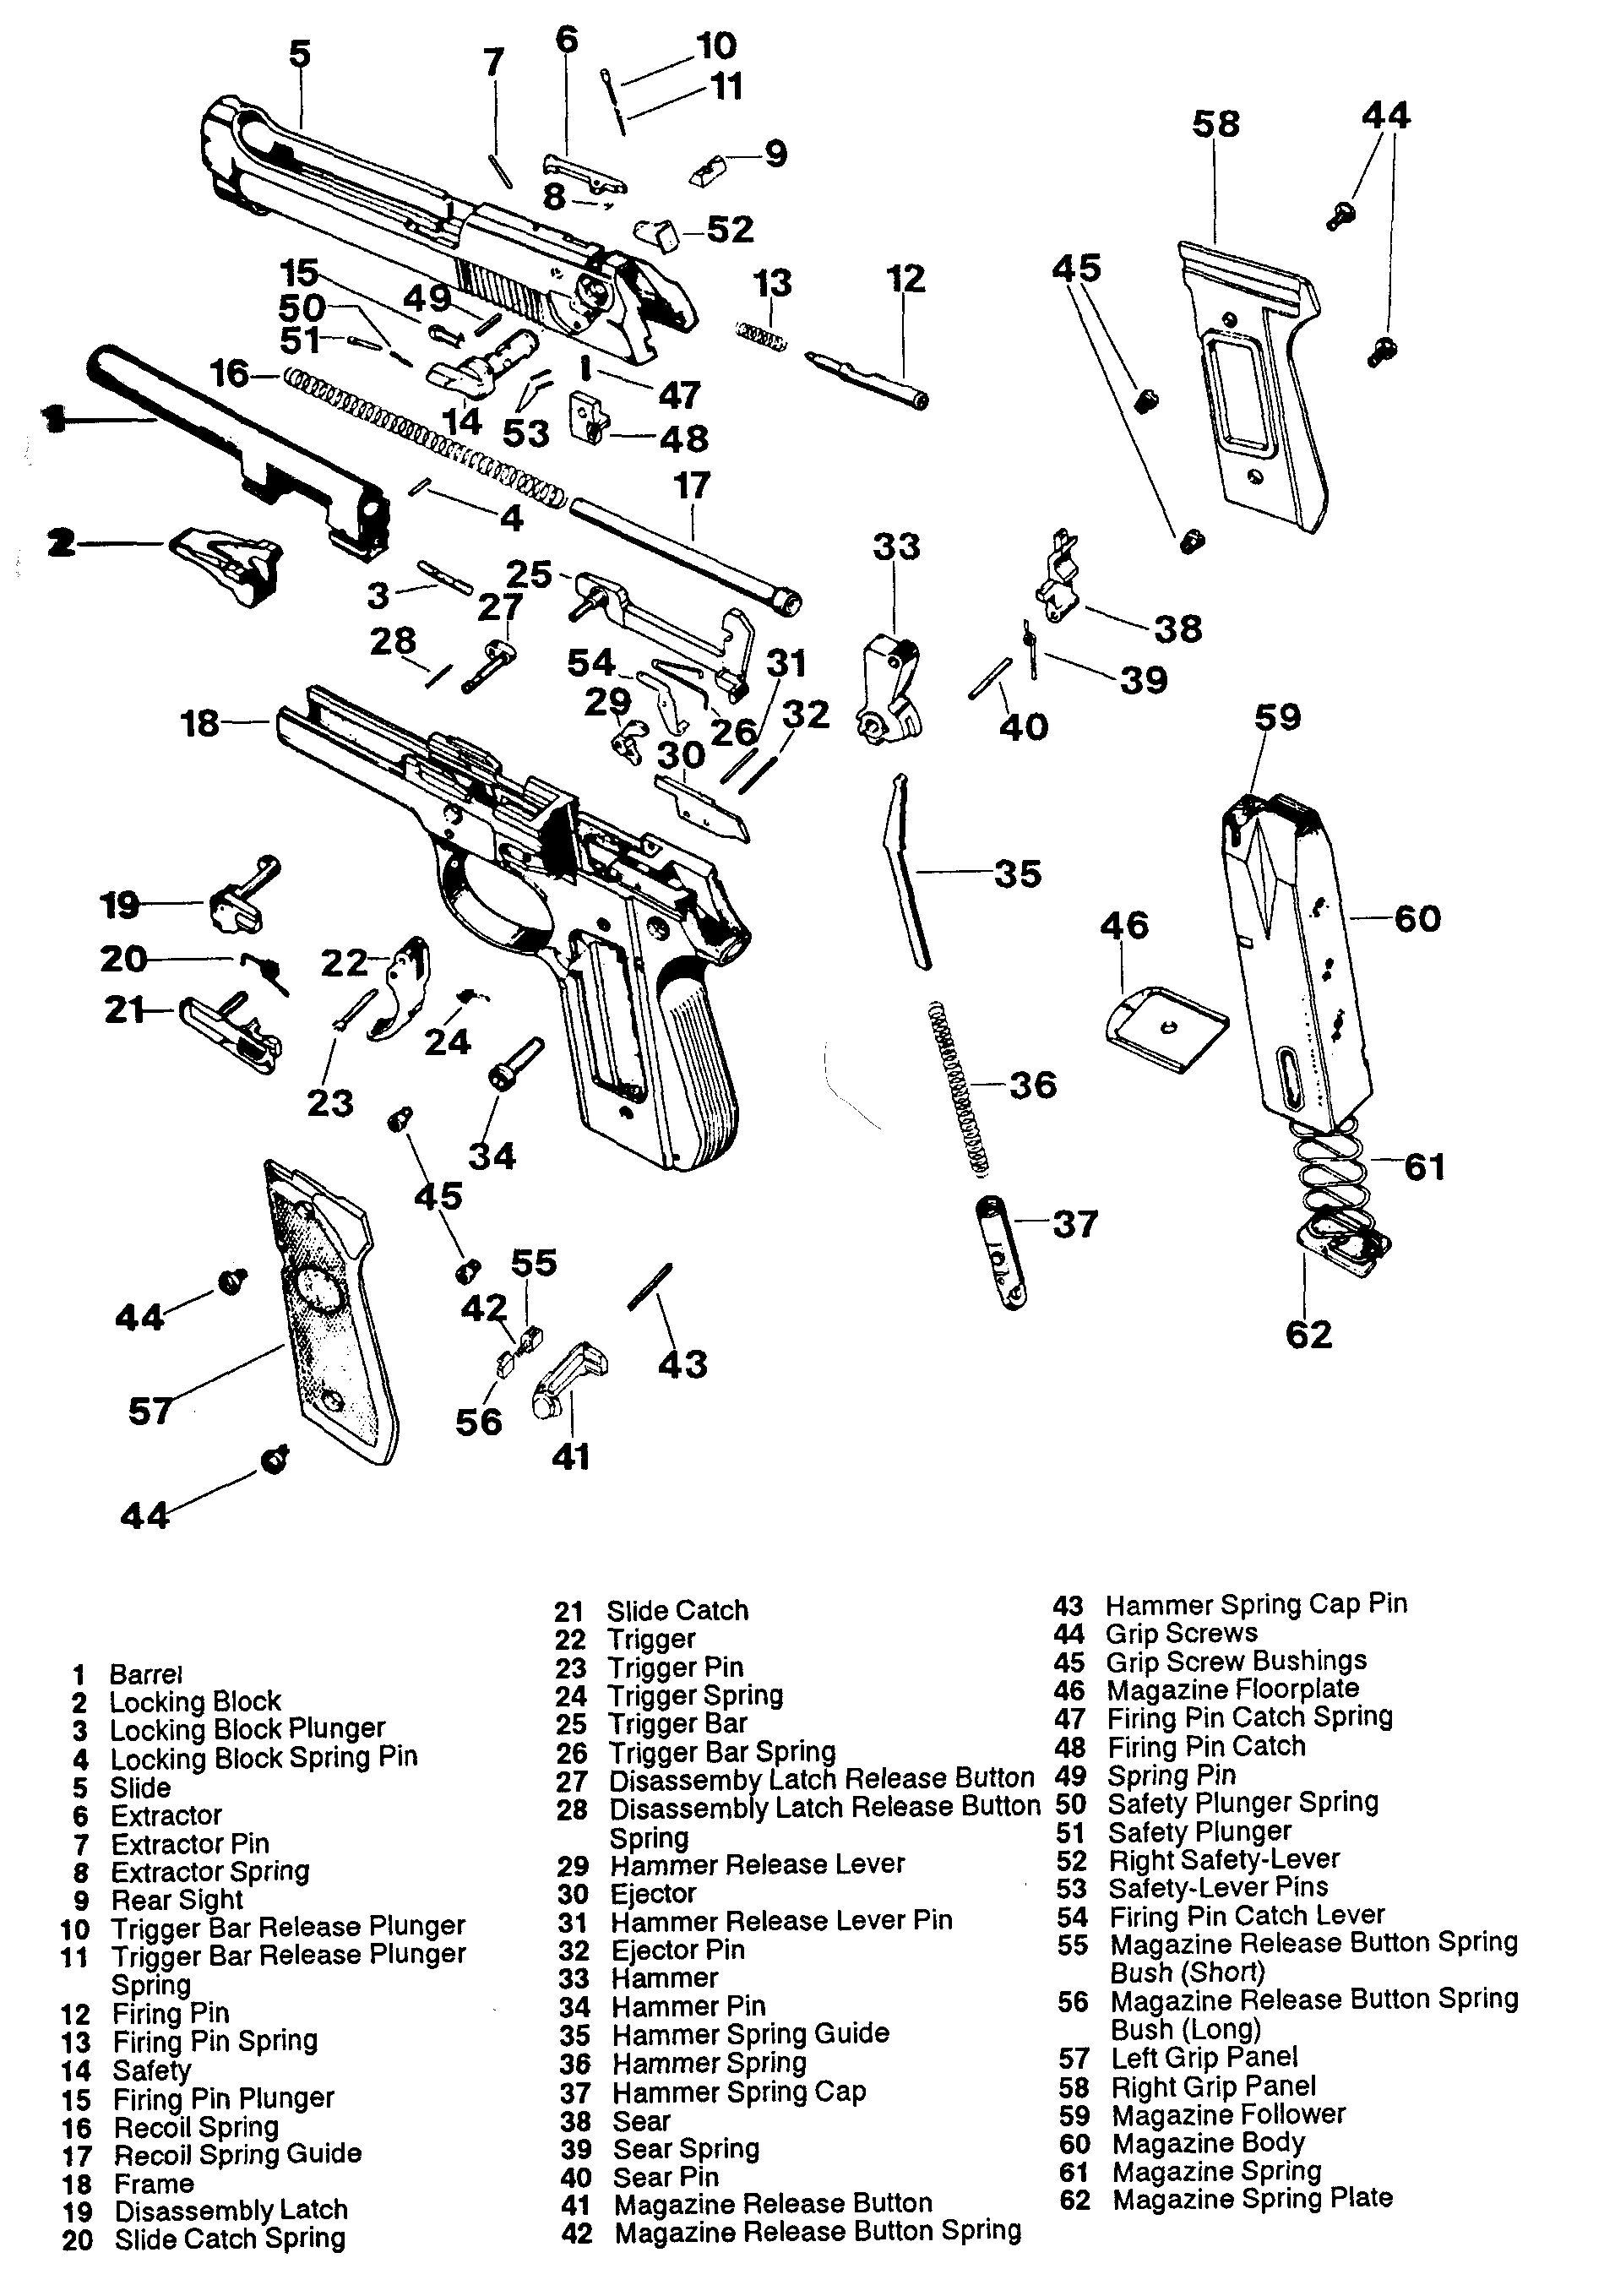 Beretta 92fs Exploded View